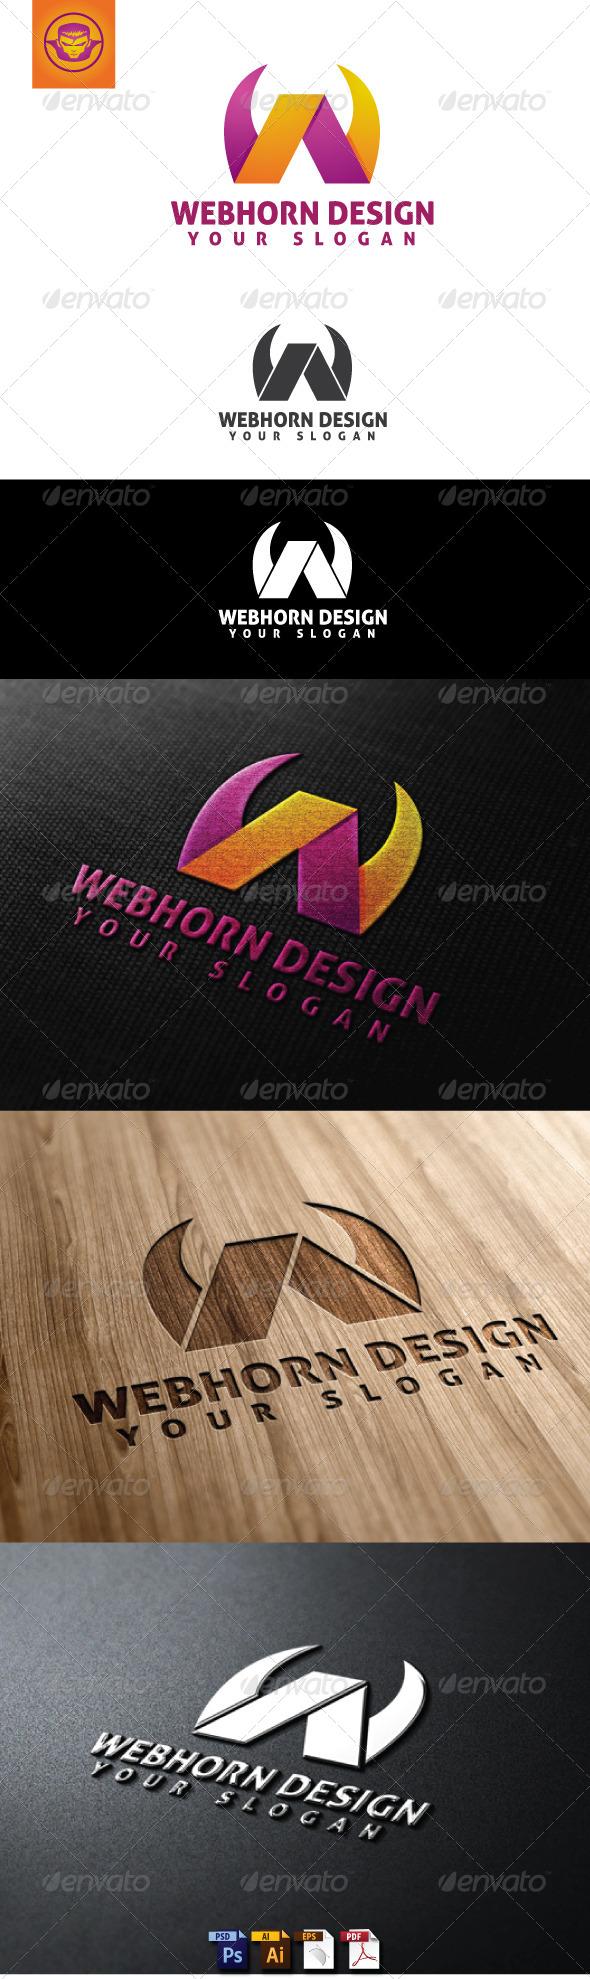 Webhorn Design Logo Template - Letters Logo Templates